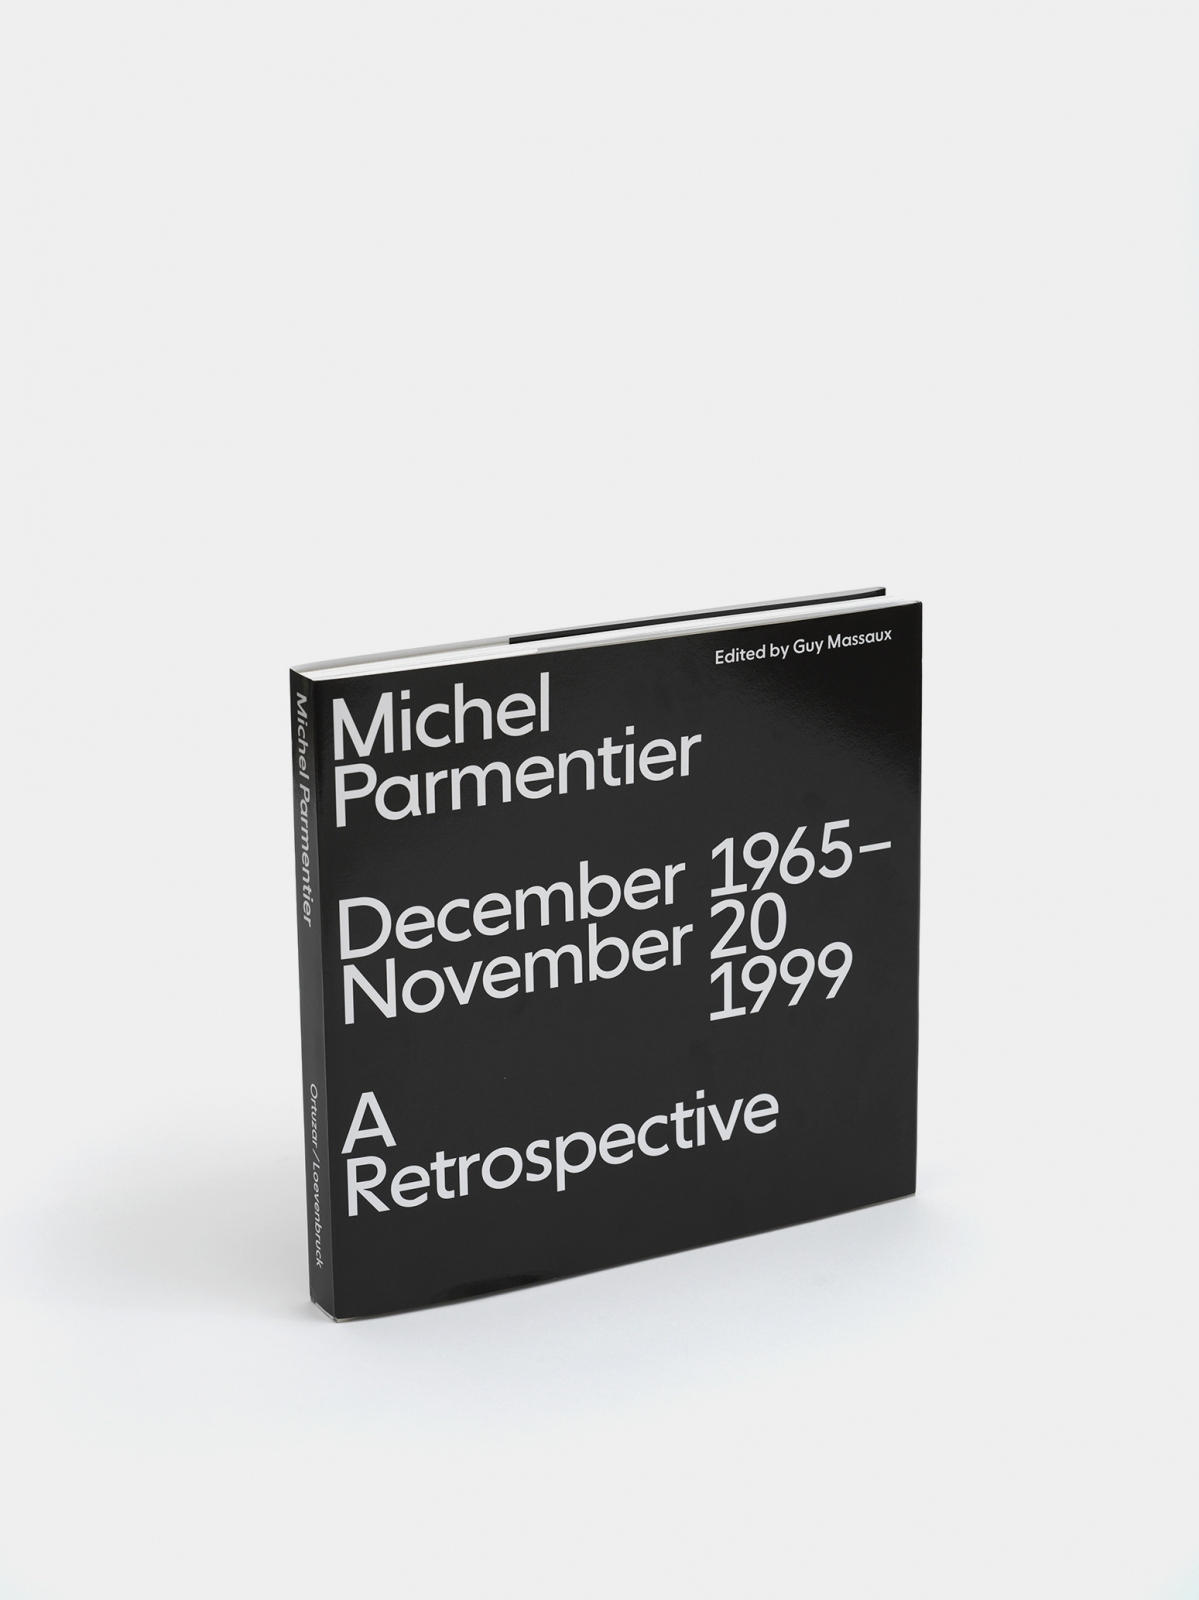 Michel Parmentier, December 1965 - November 20, 1999: A Retrospective